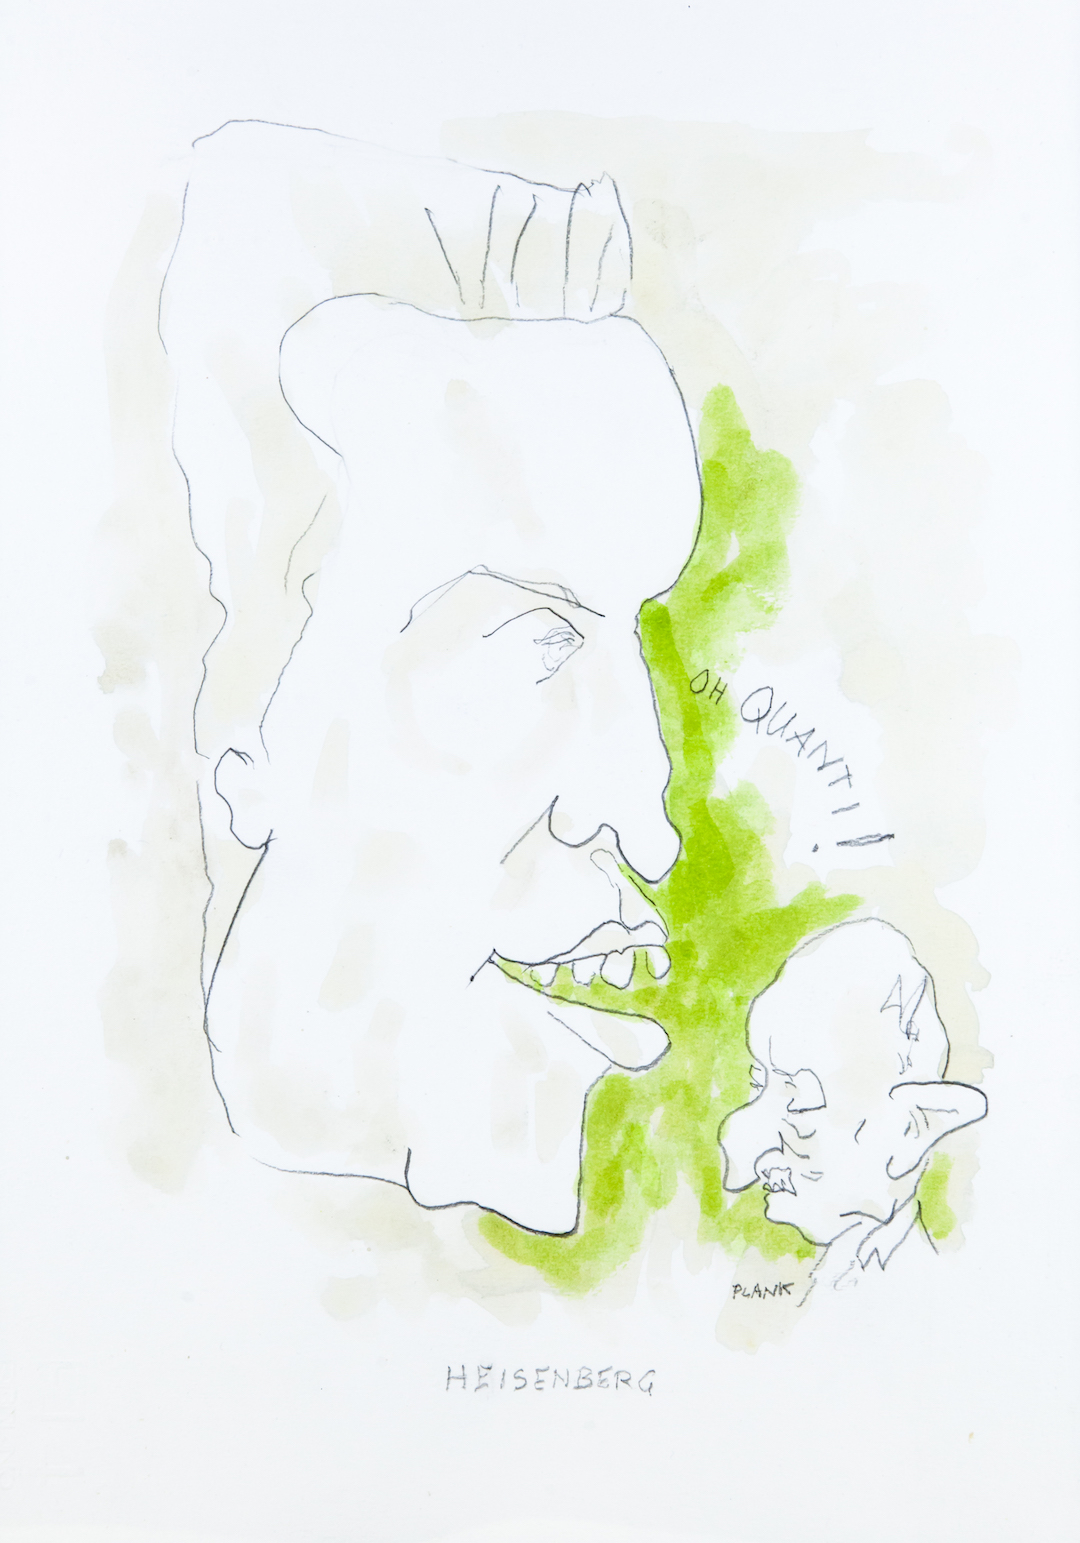 Werner Karl Heisenberg, caricatura